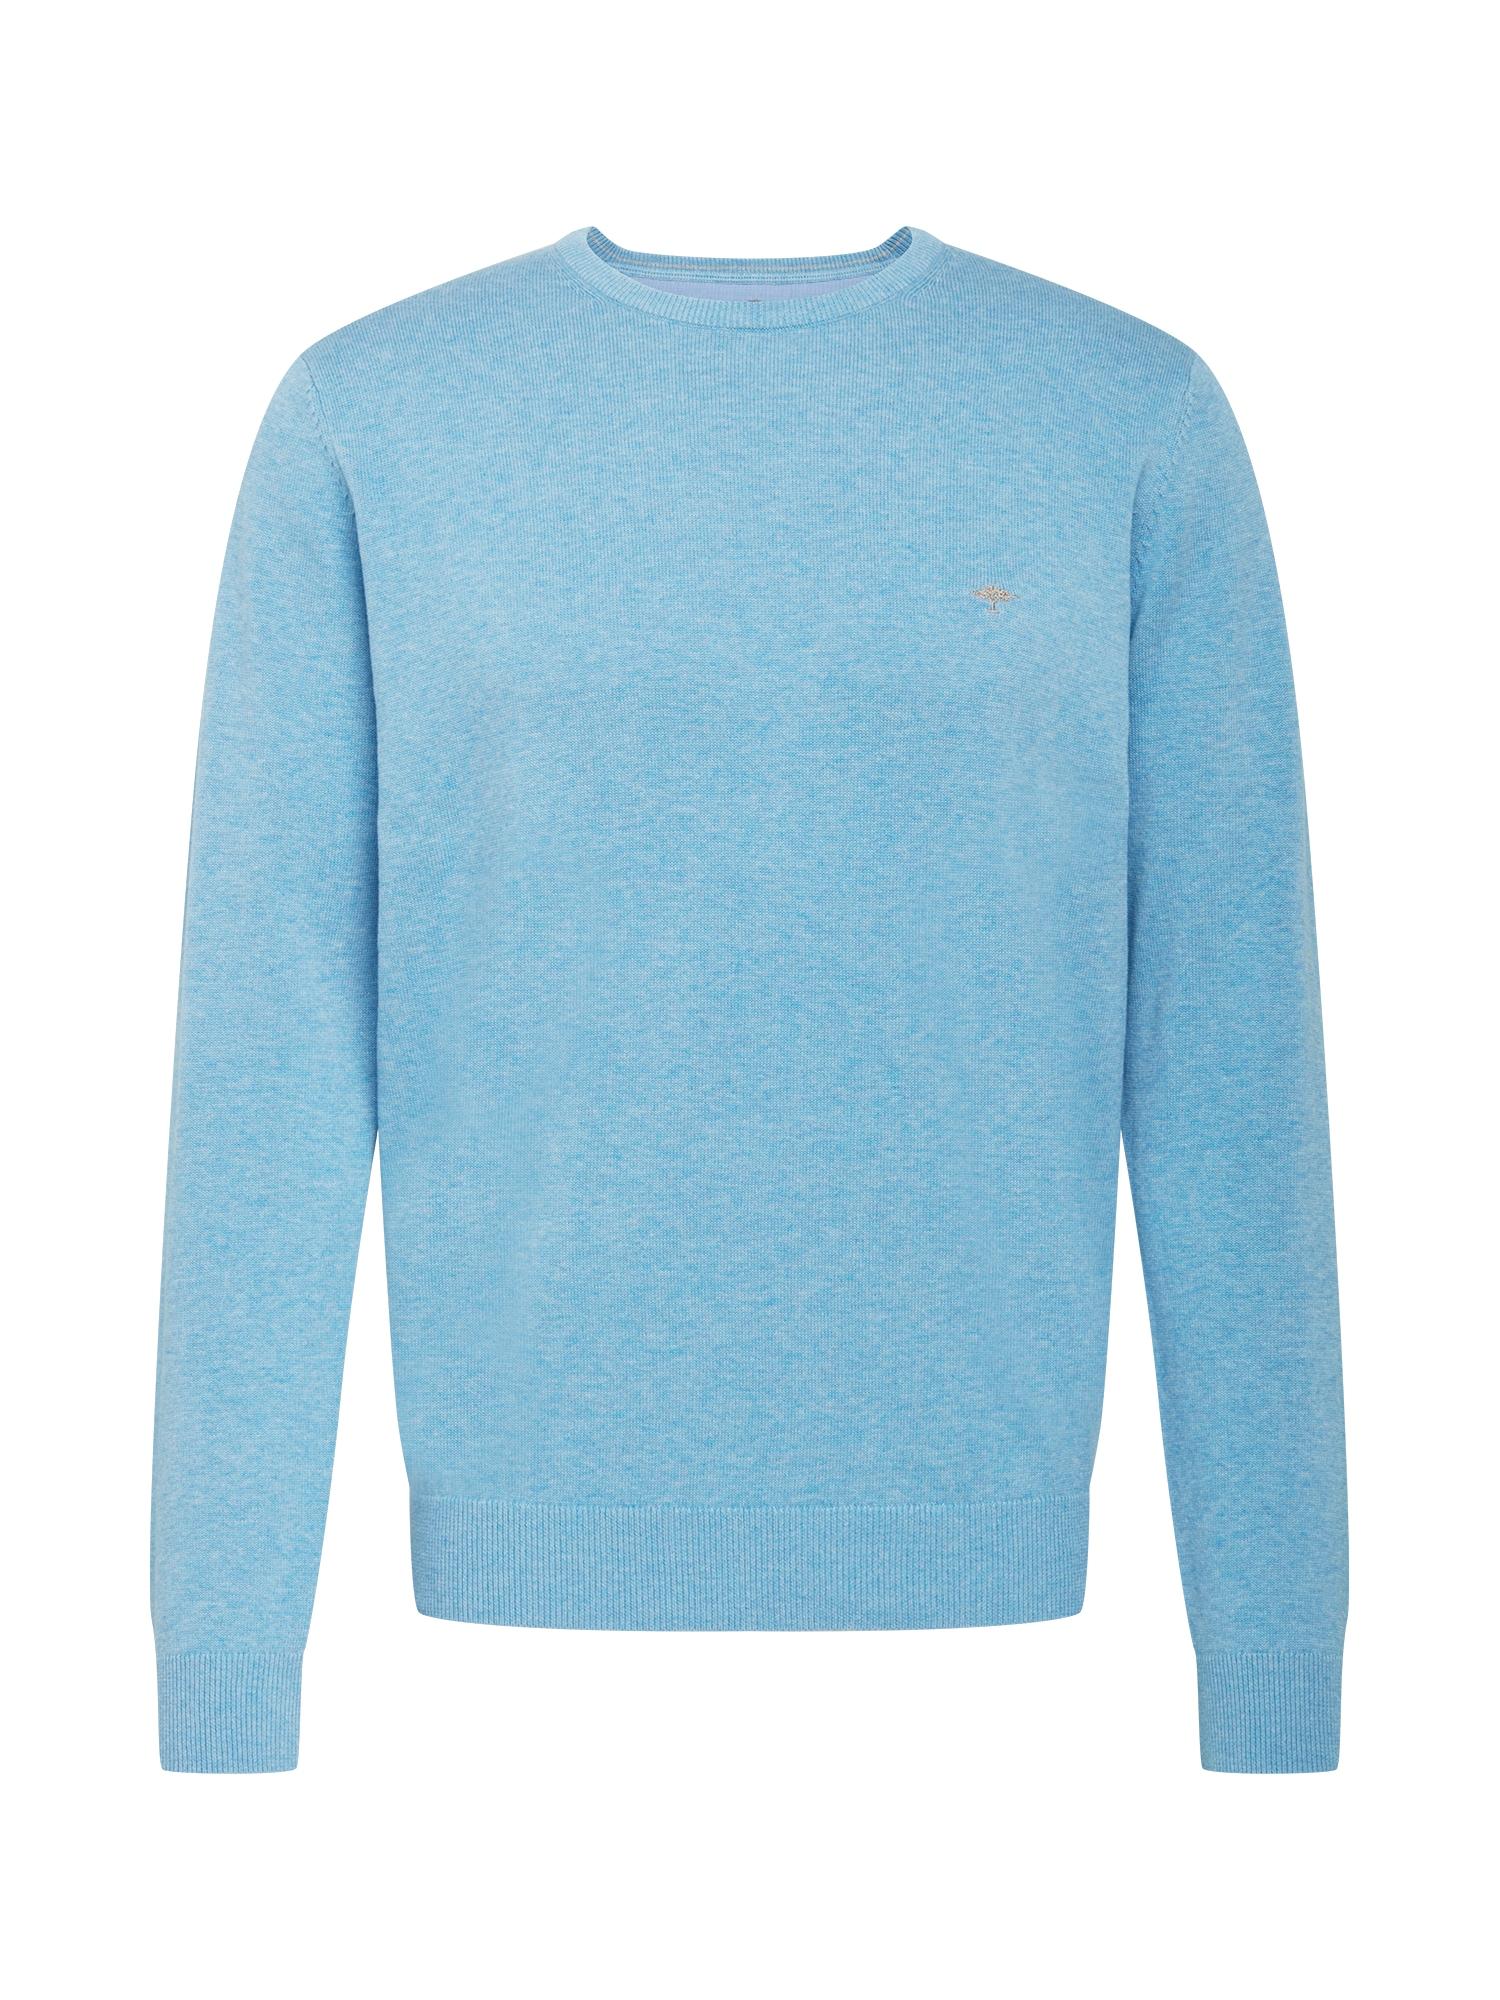 FYNCH-HATTON Megztinis šviesiai mėlyna